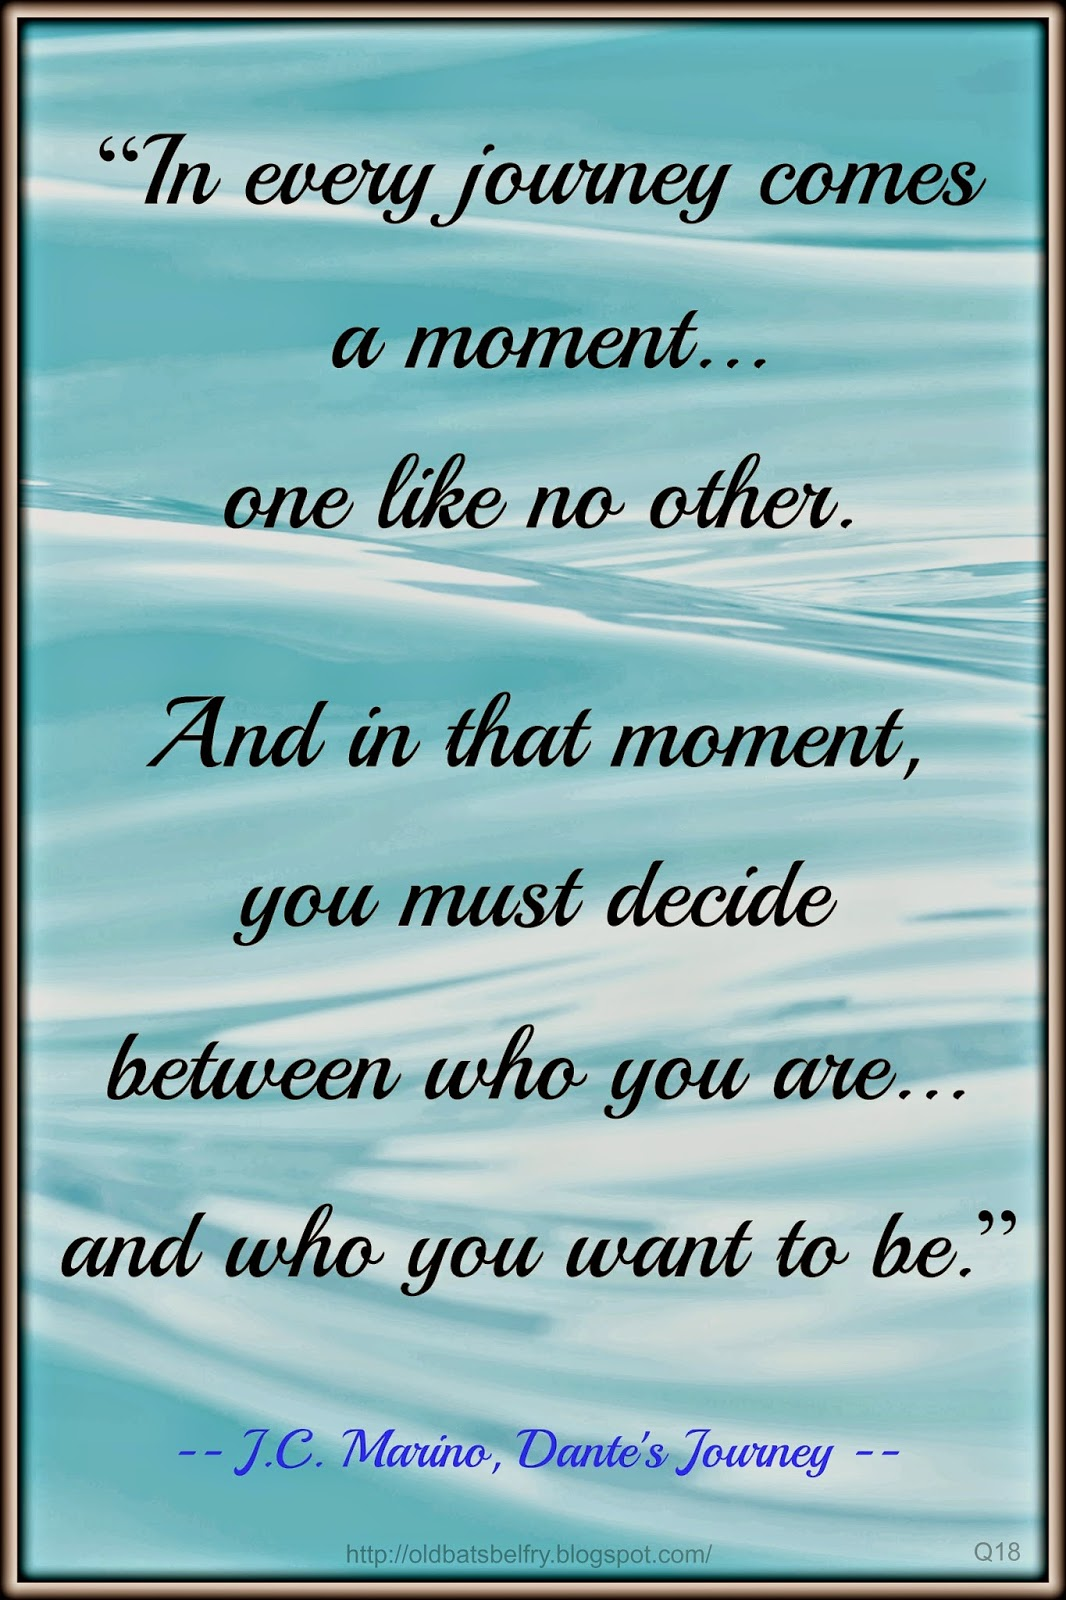 J.C. Marino ~ Dante's Journey Quote ~ Design by Mulluane